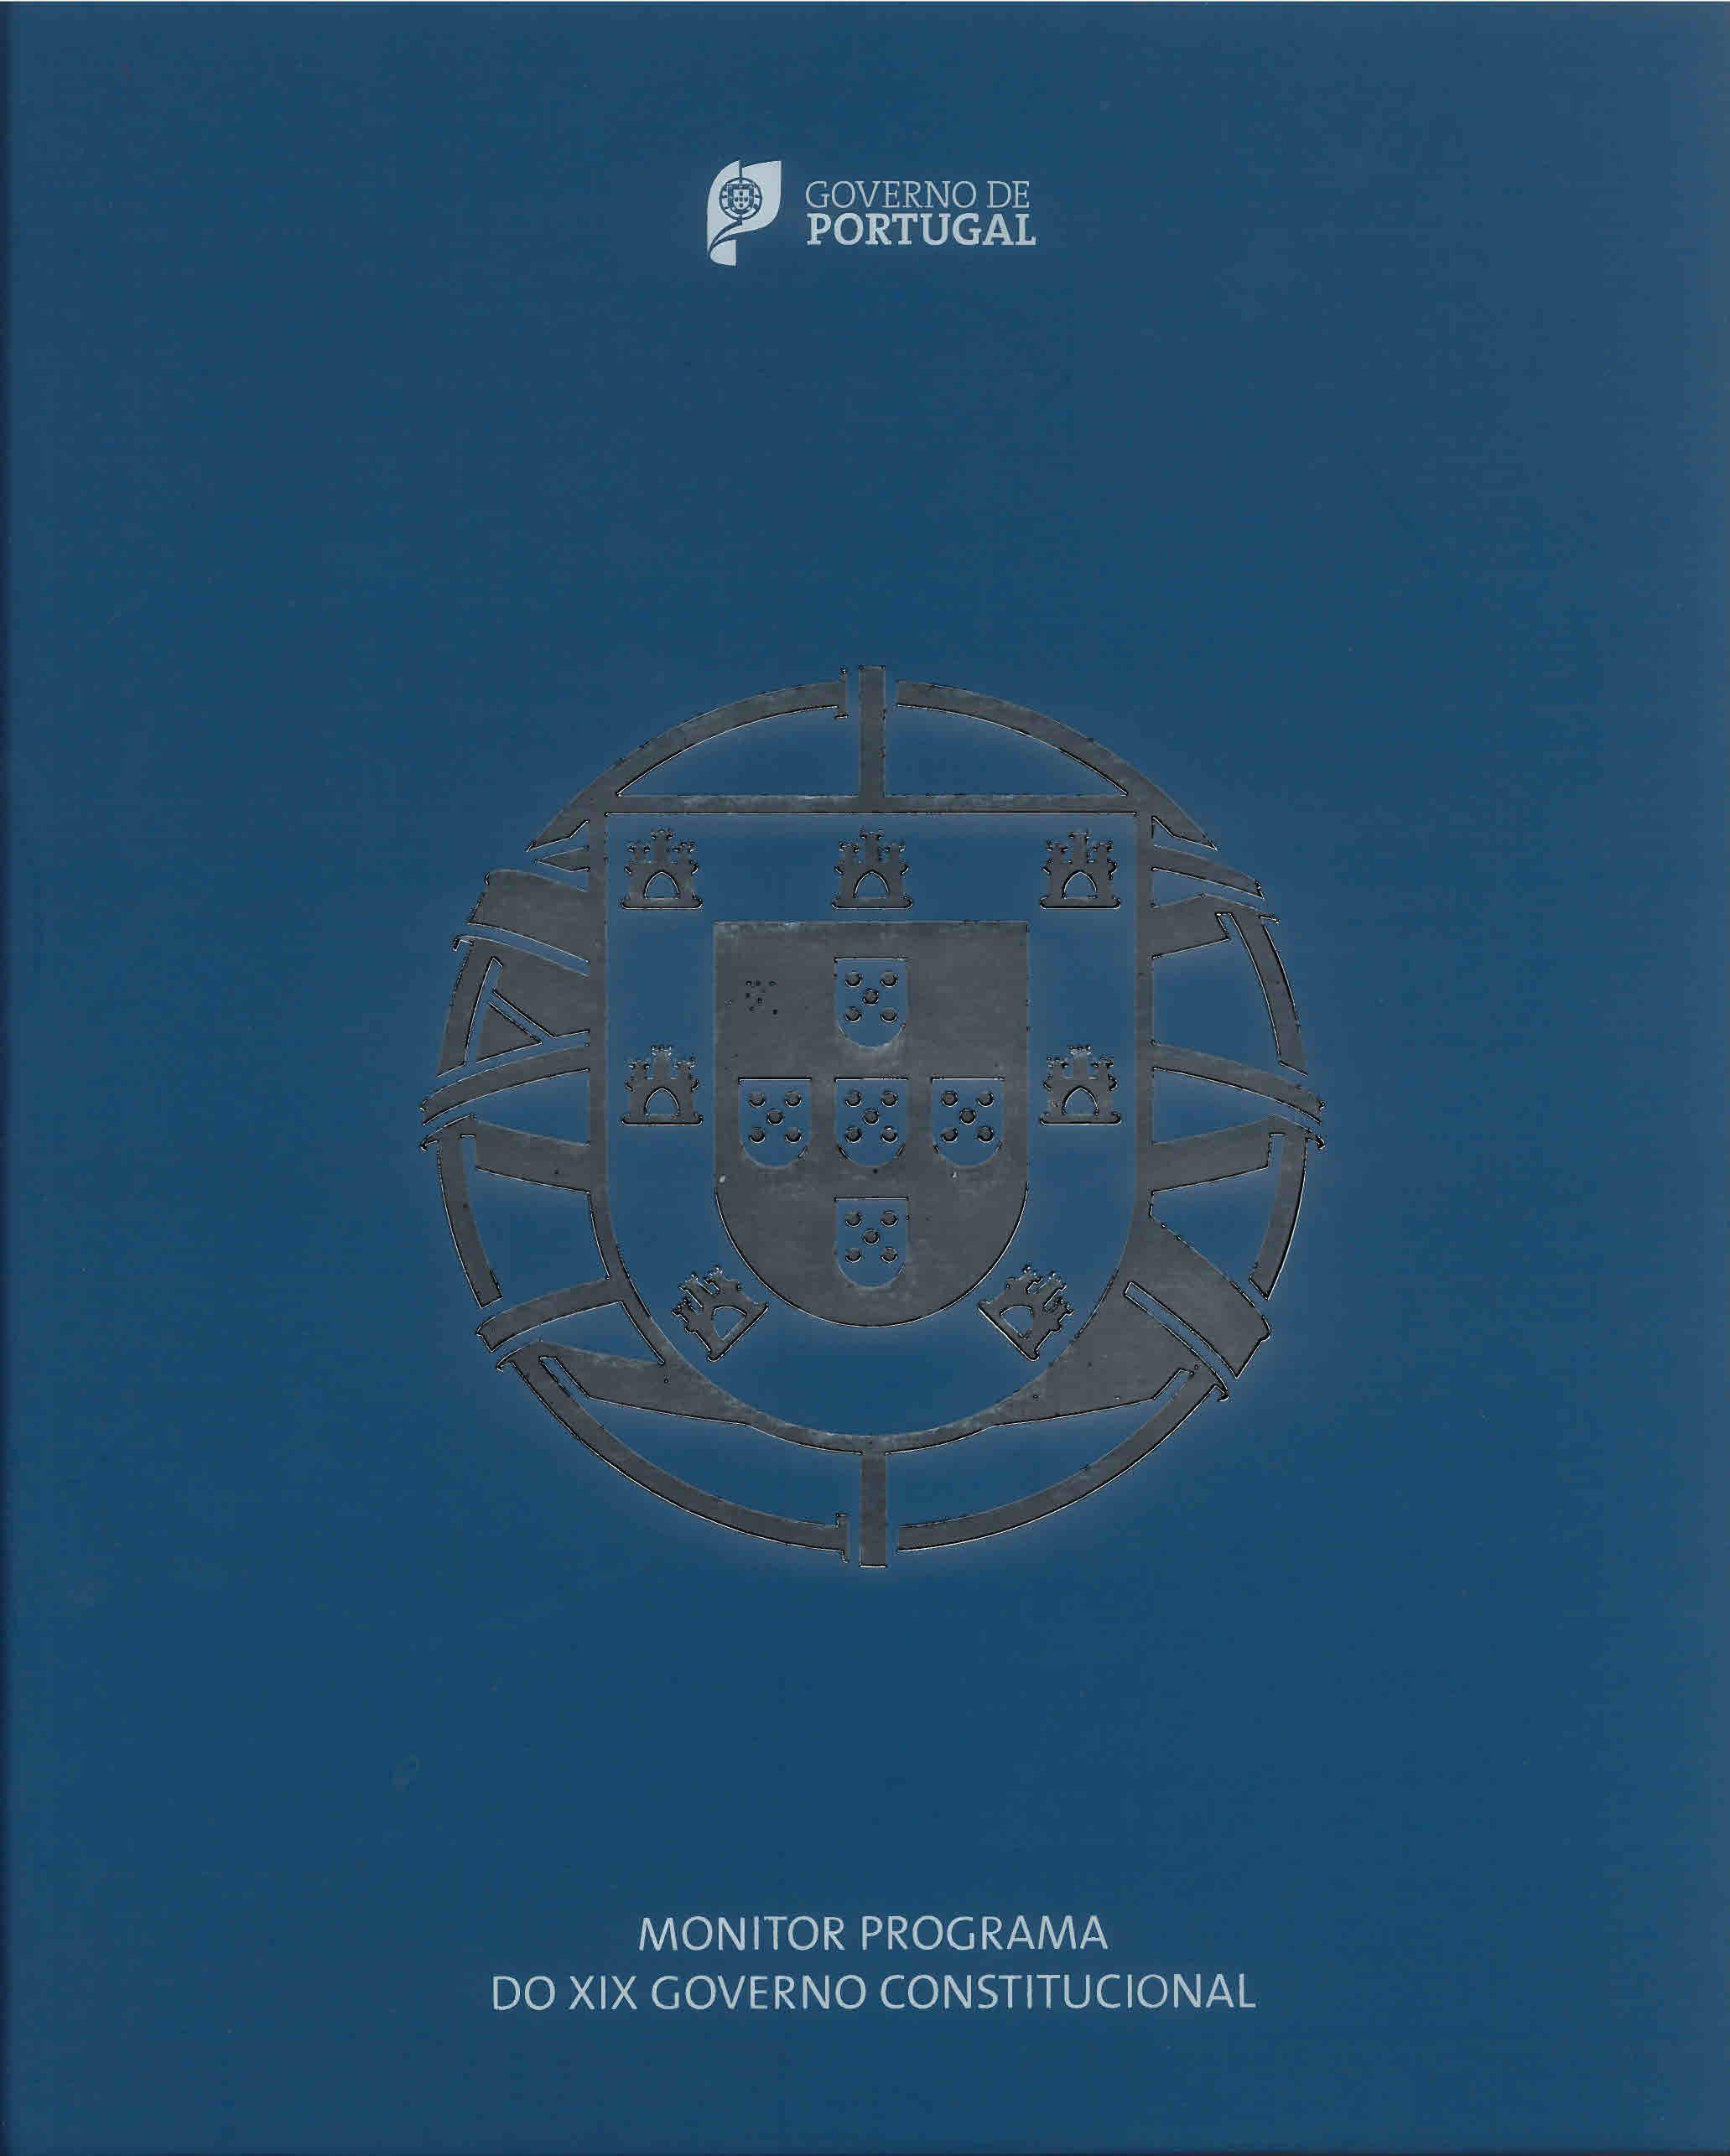 Monitor Programa do XIX Governo Constitucional